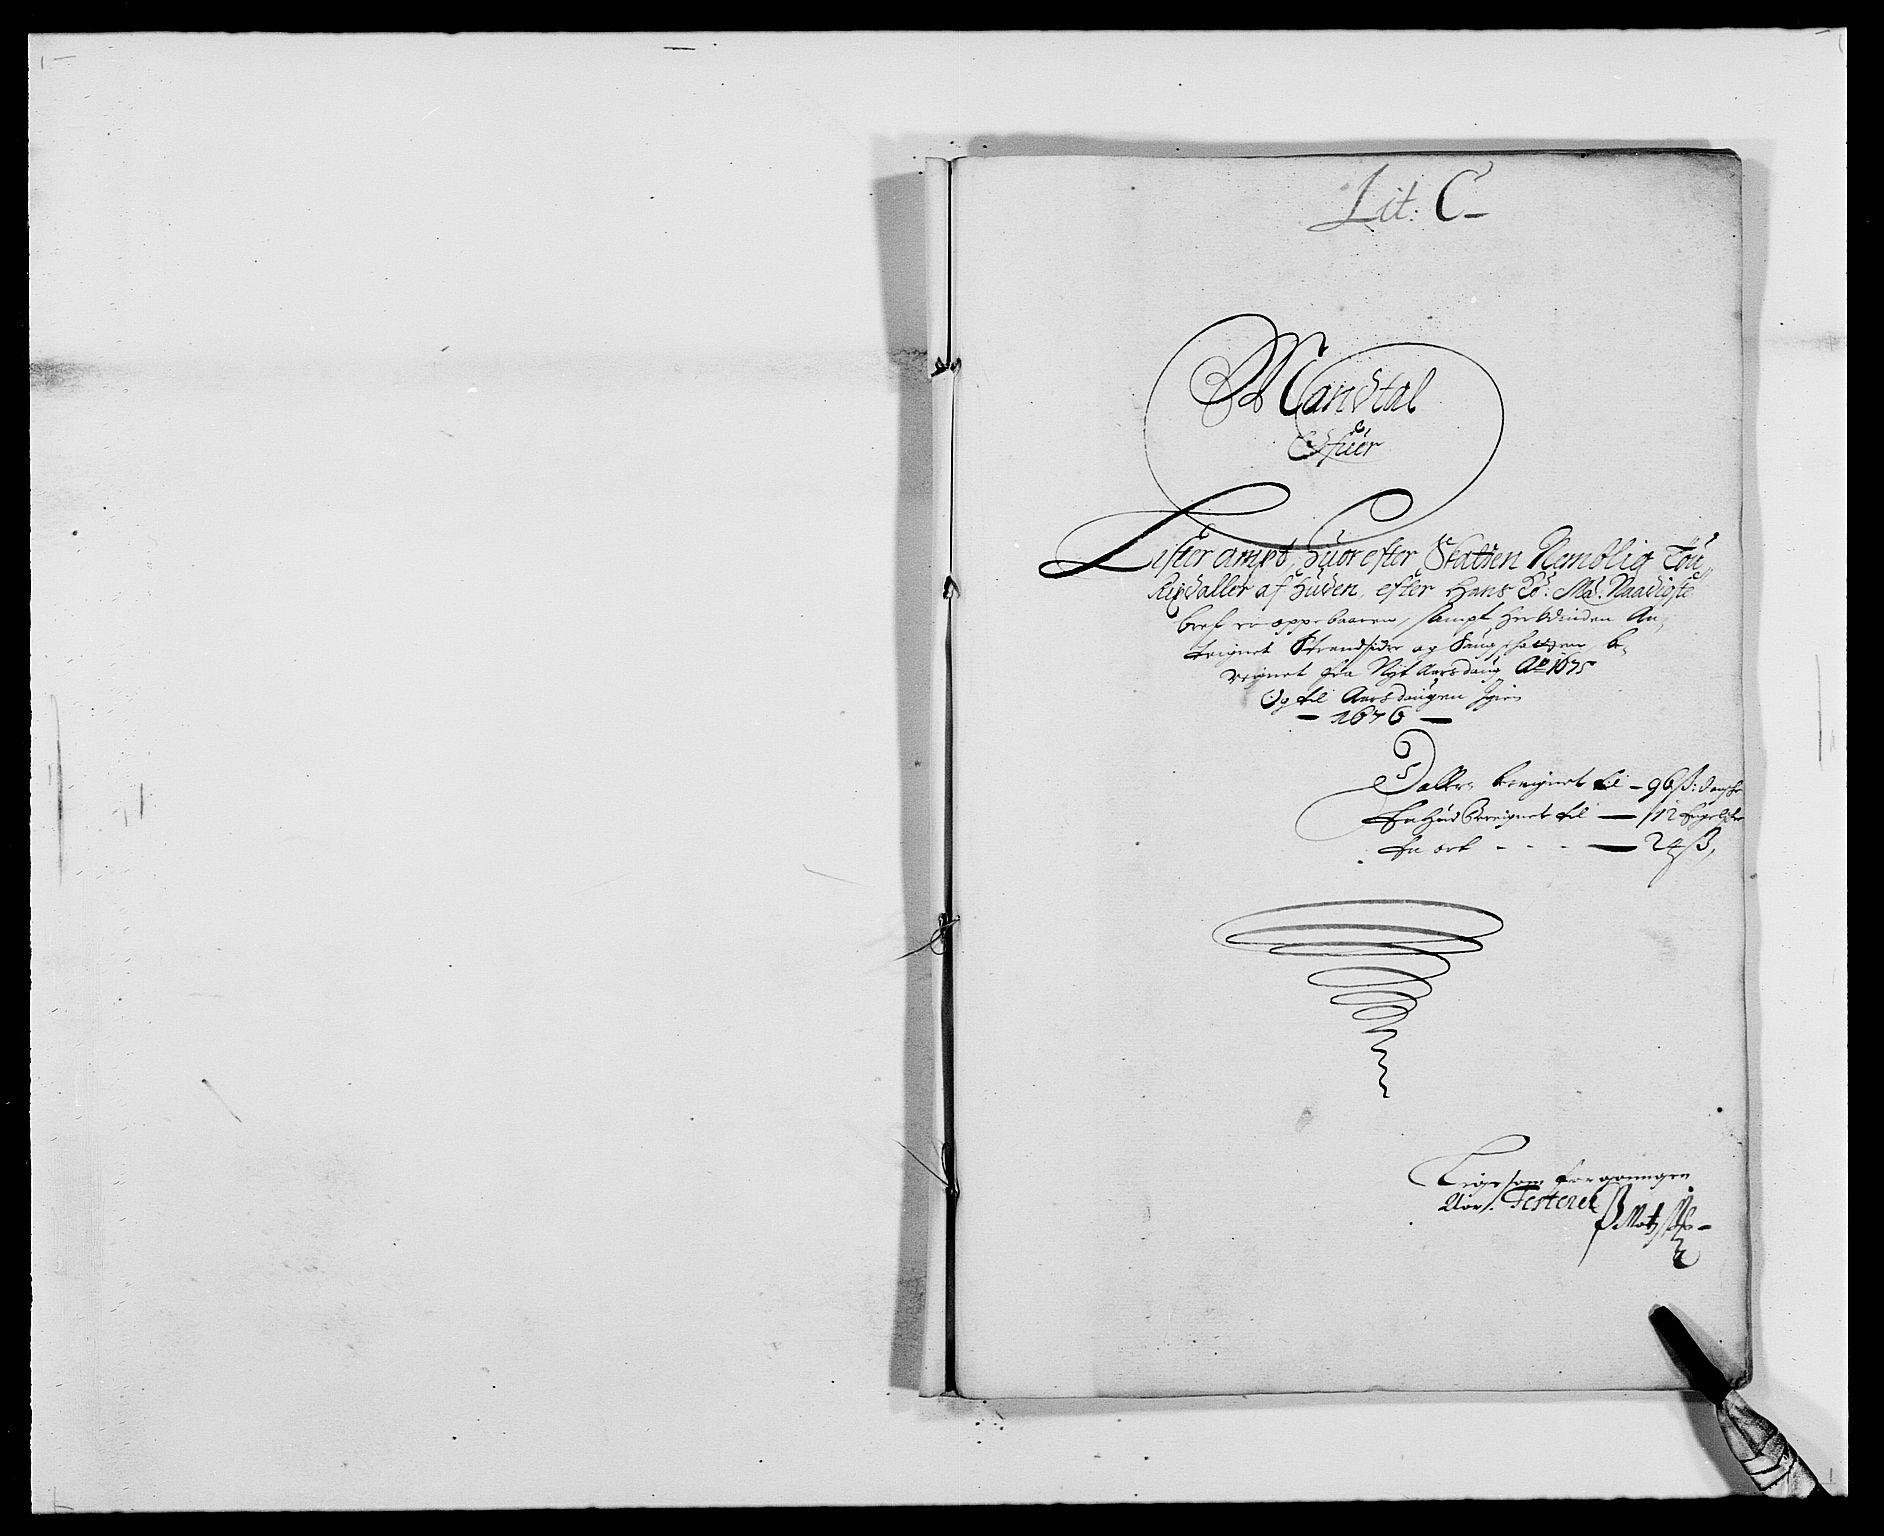 RA, Rentekammeret inntil 1814, Reviderte regnskaper, Fogderegnskap, R41/L2529: Fogderegnskap Lista, 1675-1676, s. 49